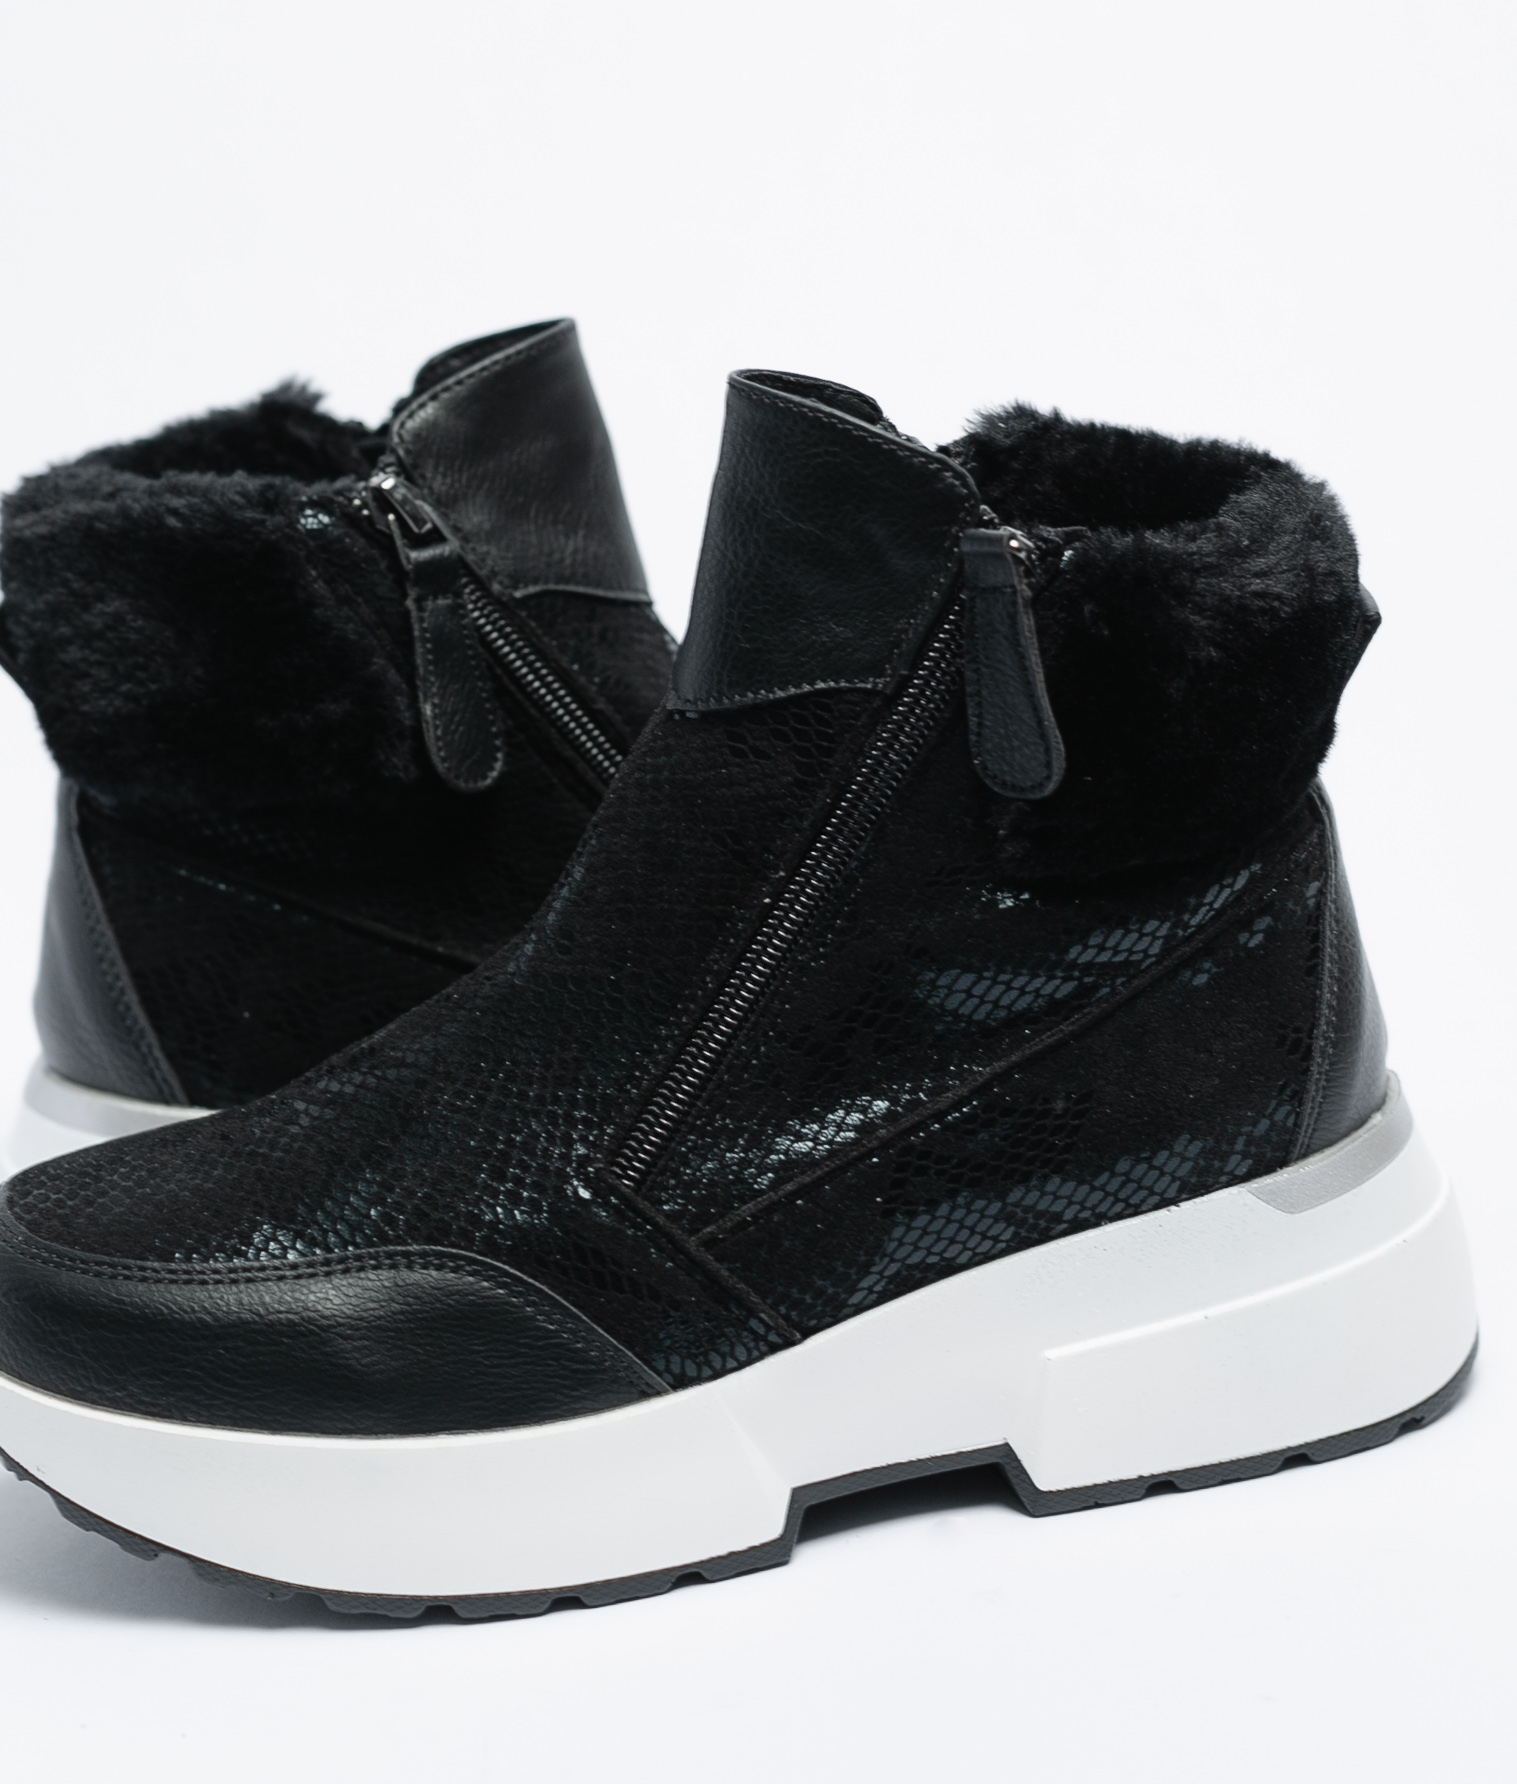 Botas bajas Yiya - Negro